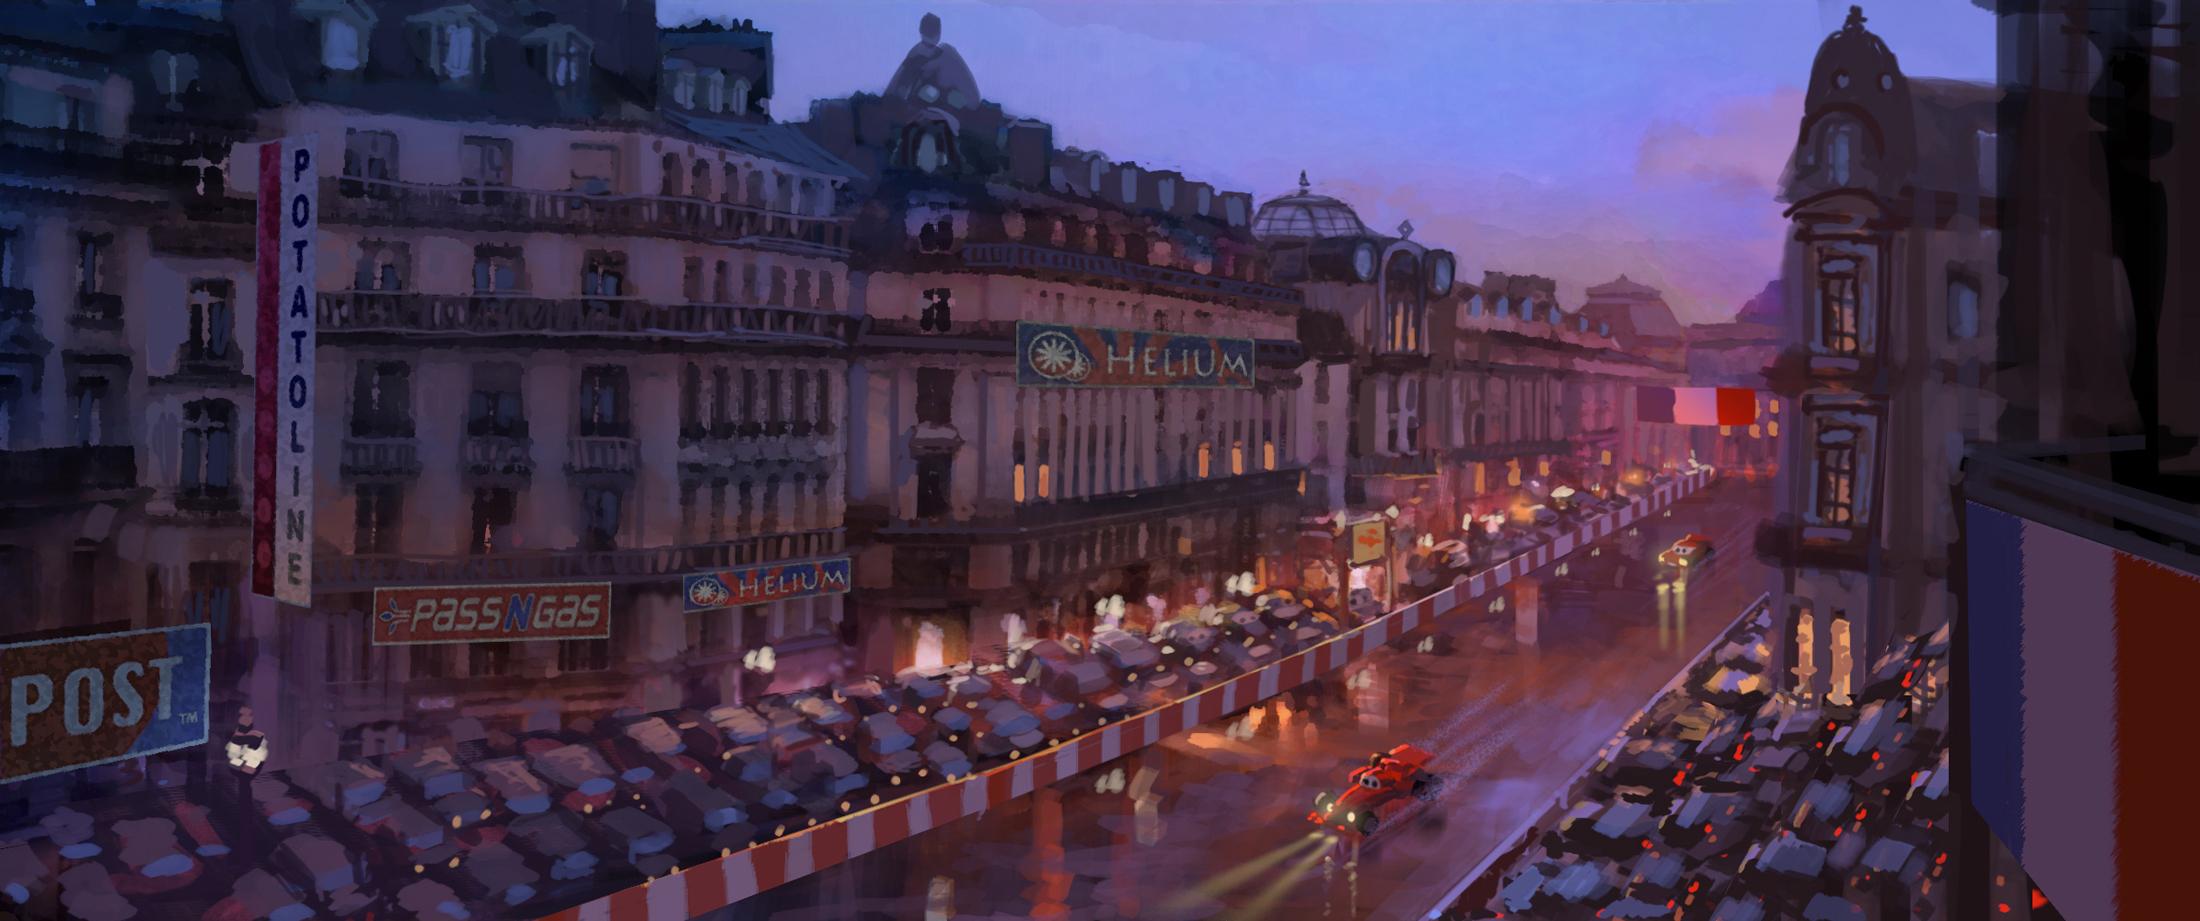 Disney pixar releases plethora of cars 2 concept art for Salon pixar paris